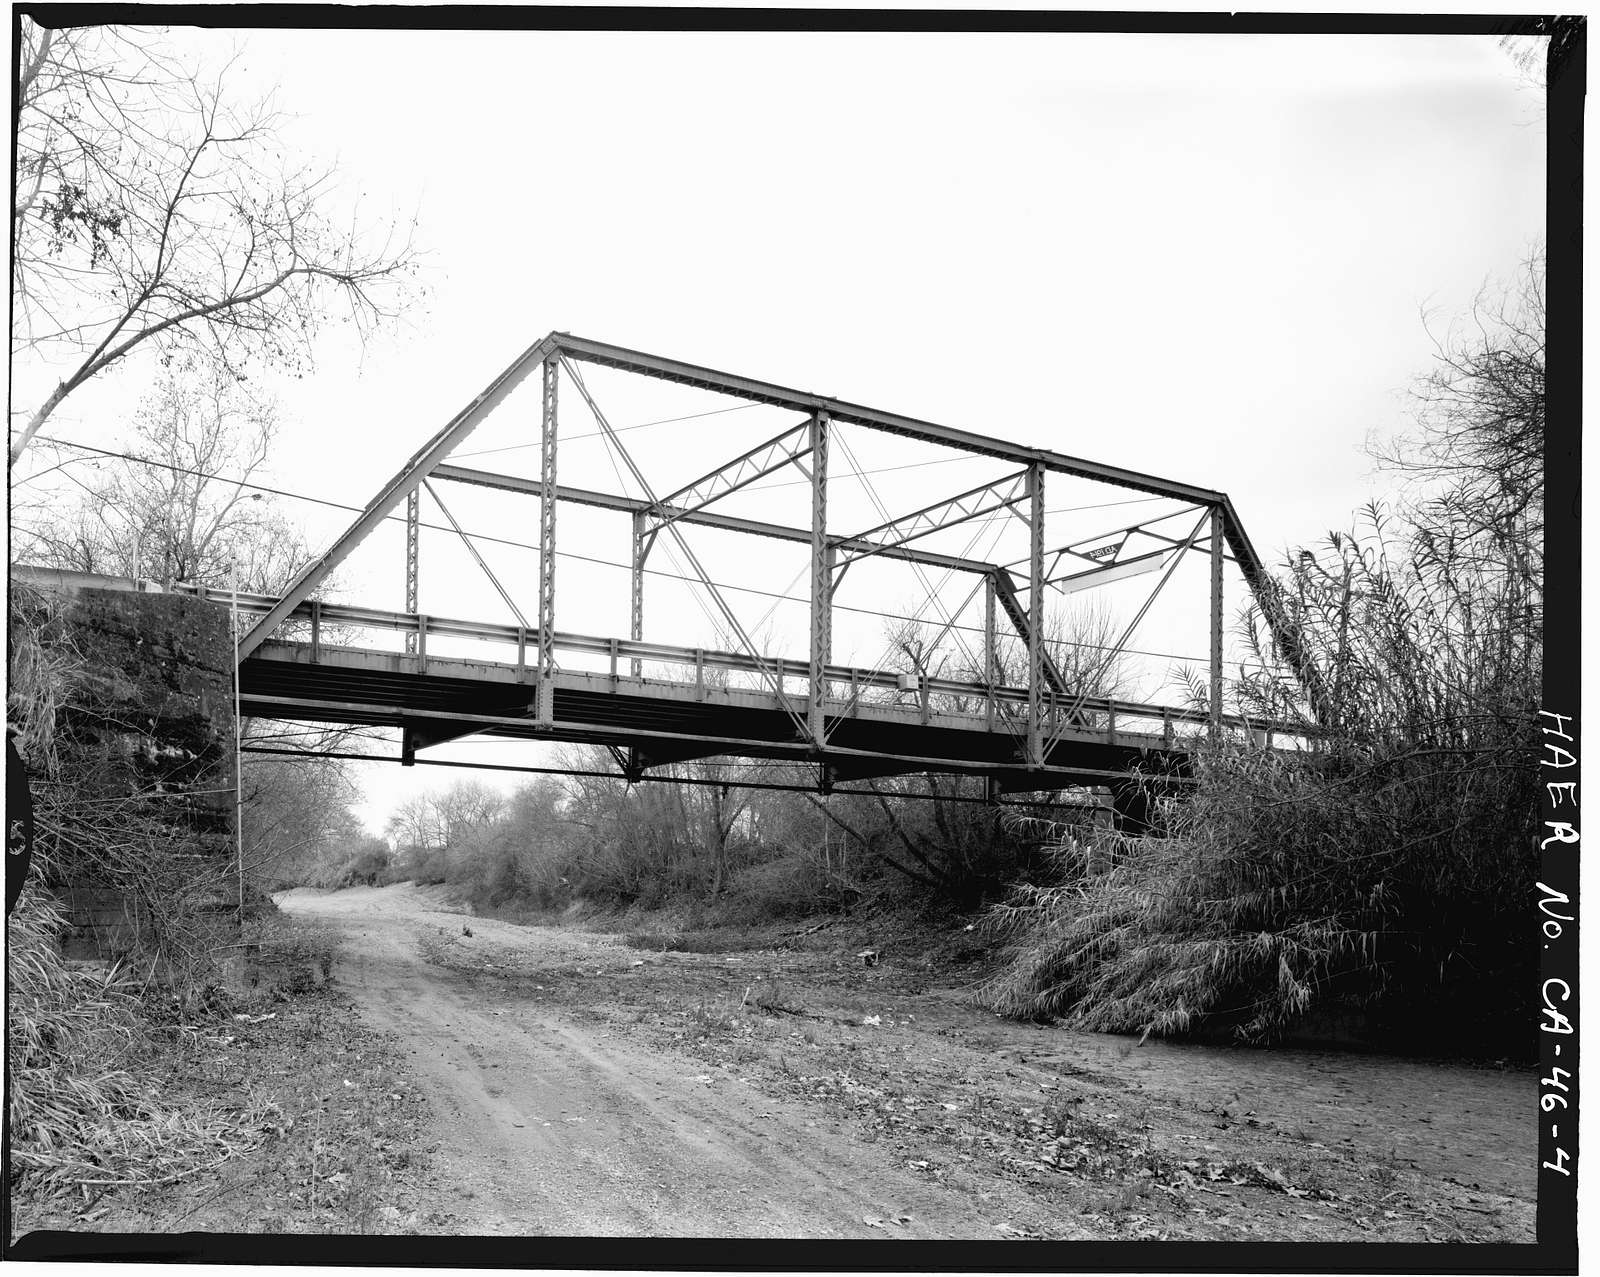 Pacheco Creek Bridge, San Felipe Road ,spanning Pacheco Creek, San Felipe, Santa Clara County, CA